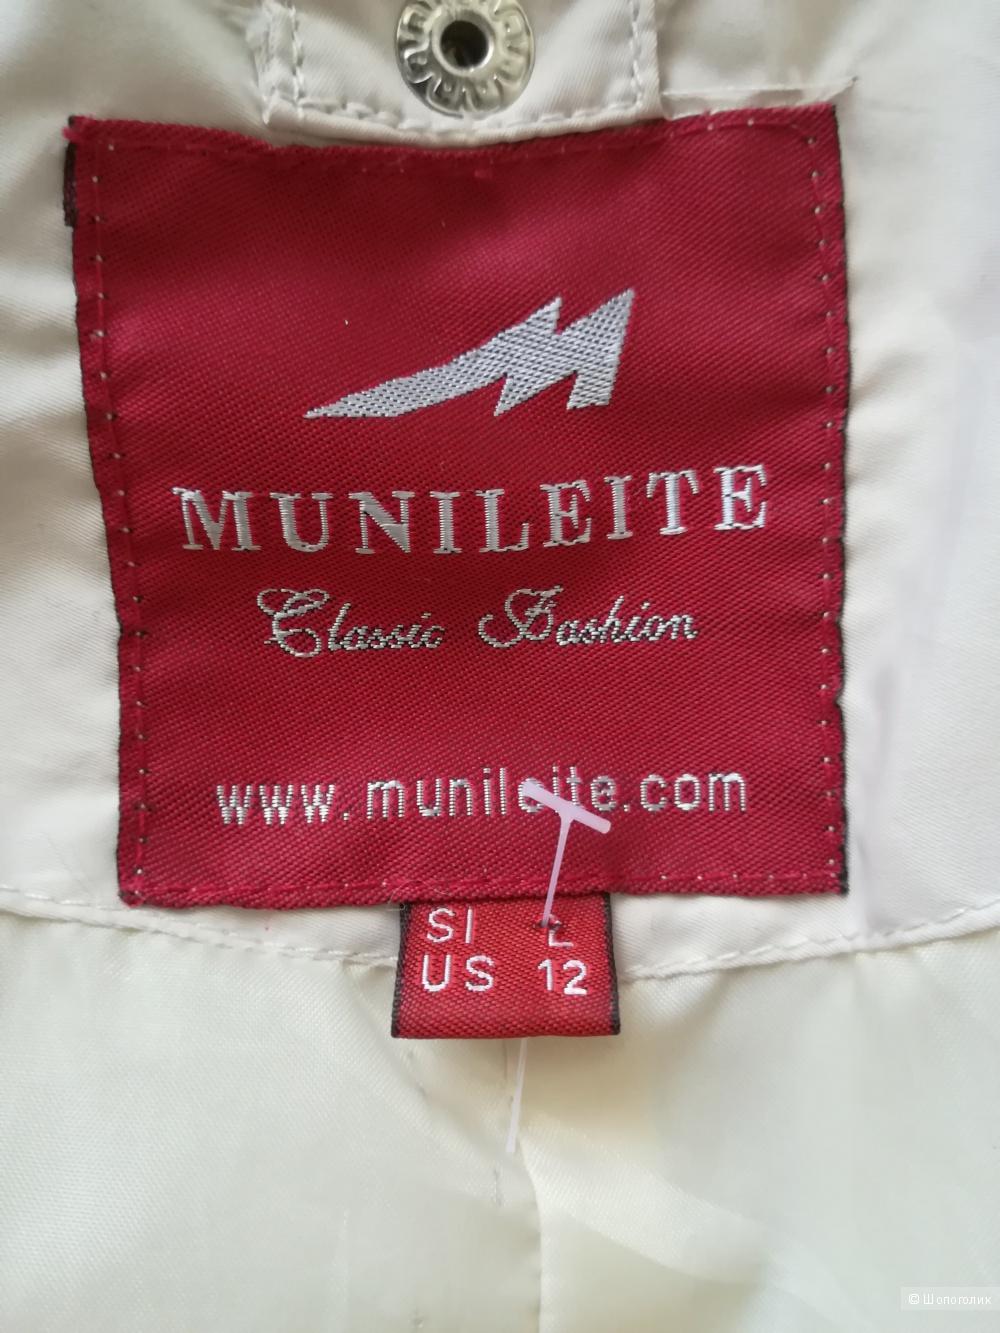 Пуховик Munileite, размер М/L